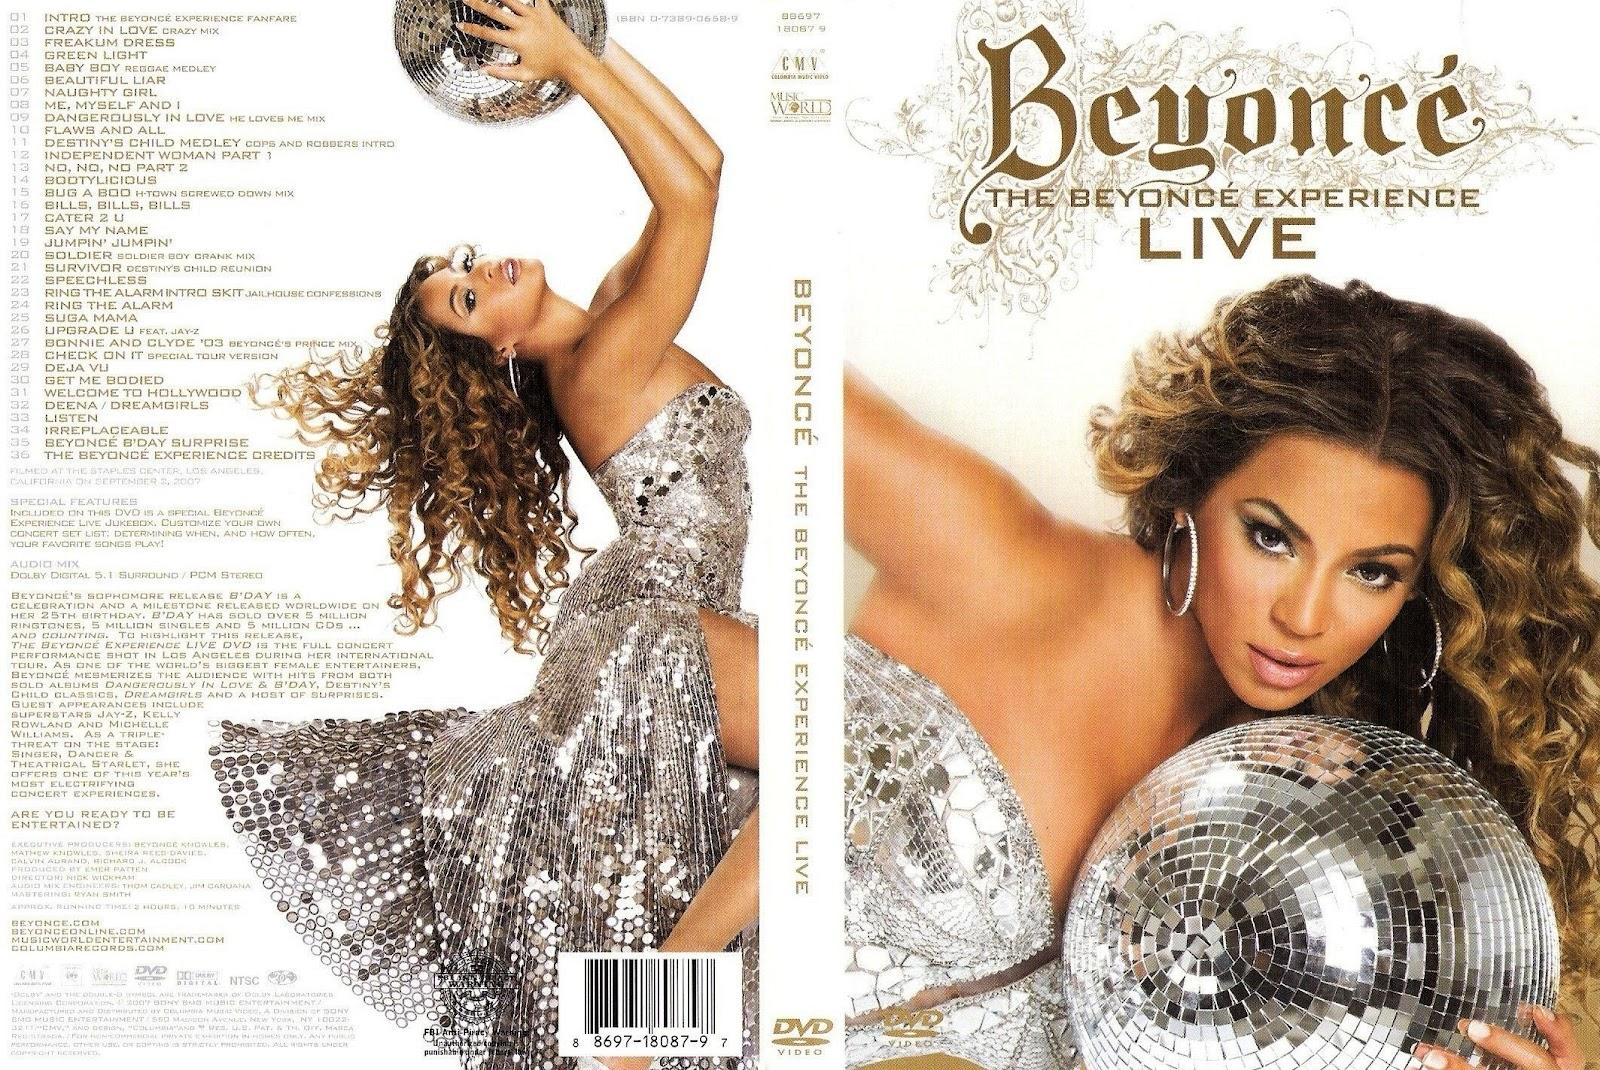 http://2.bp.blogspot.com/-QxWzjoWExYs/UGuZszXL9TI/AAAAAAAAIMs/G0MhLWpkHus/s1600/Beyonce+.-.+The+Beyonce+experience.jpg